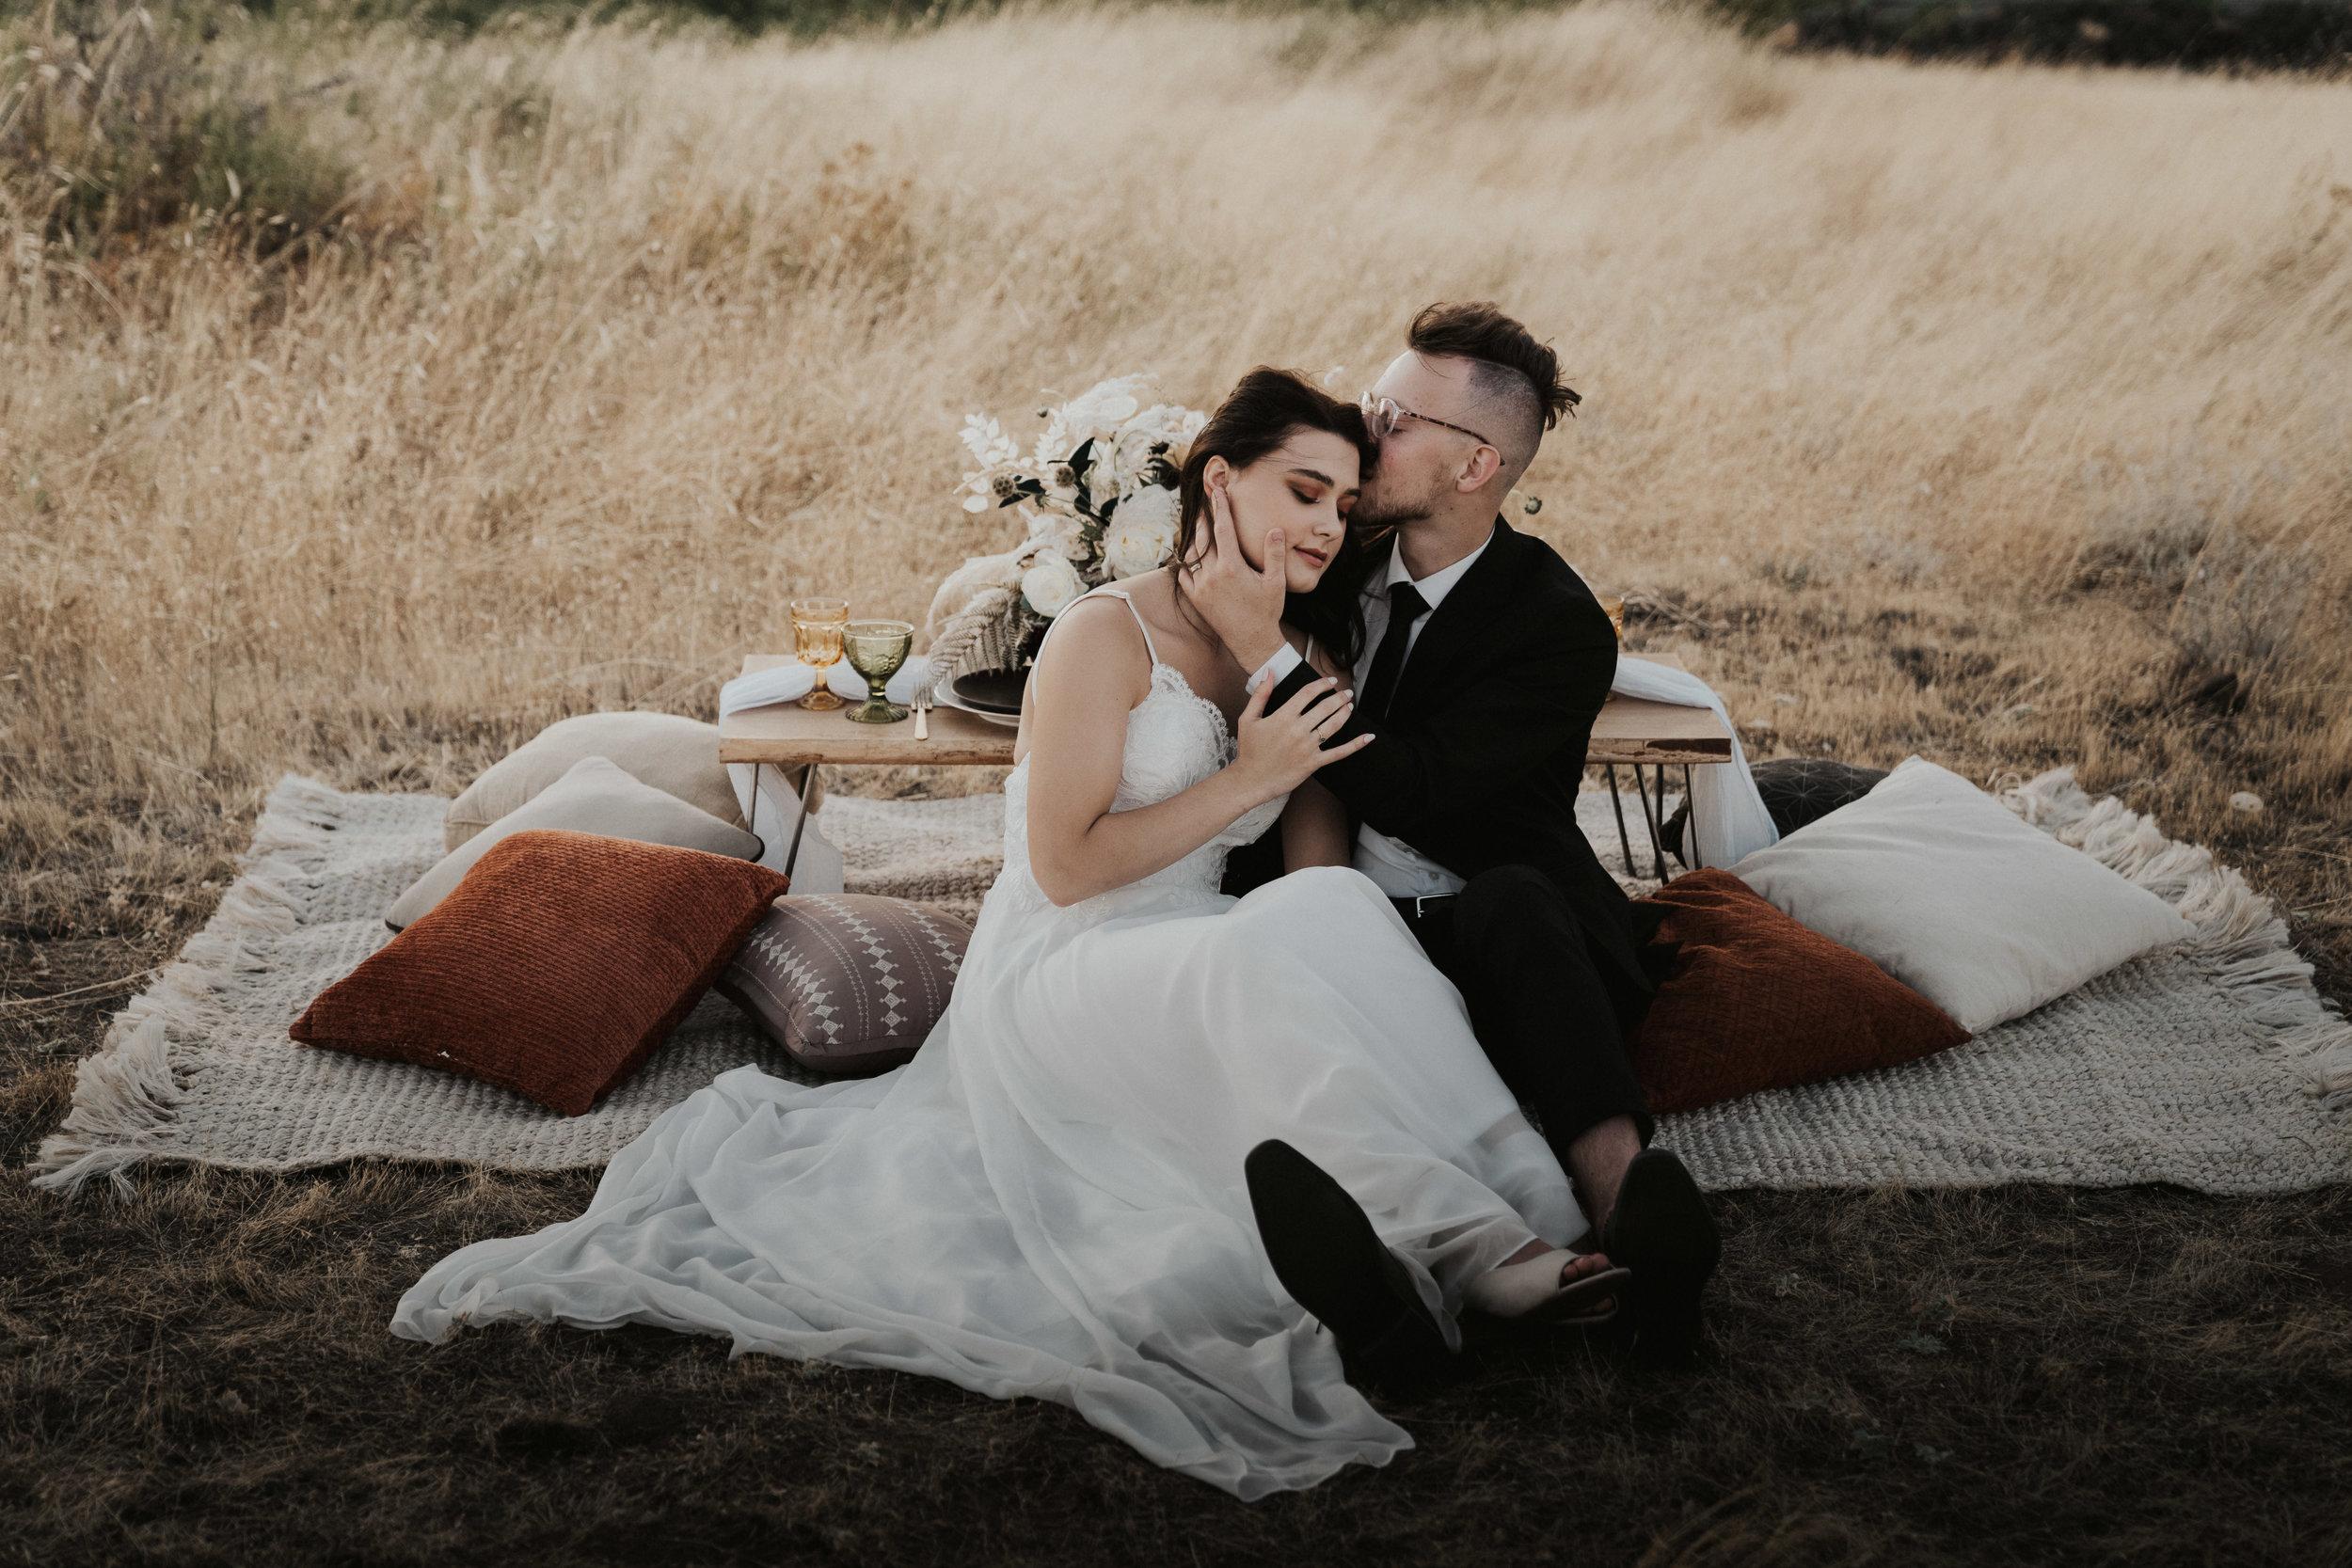 columbia-river-gorge-wedding-elopement-inspiration-8.jpg